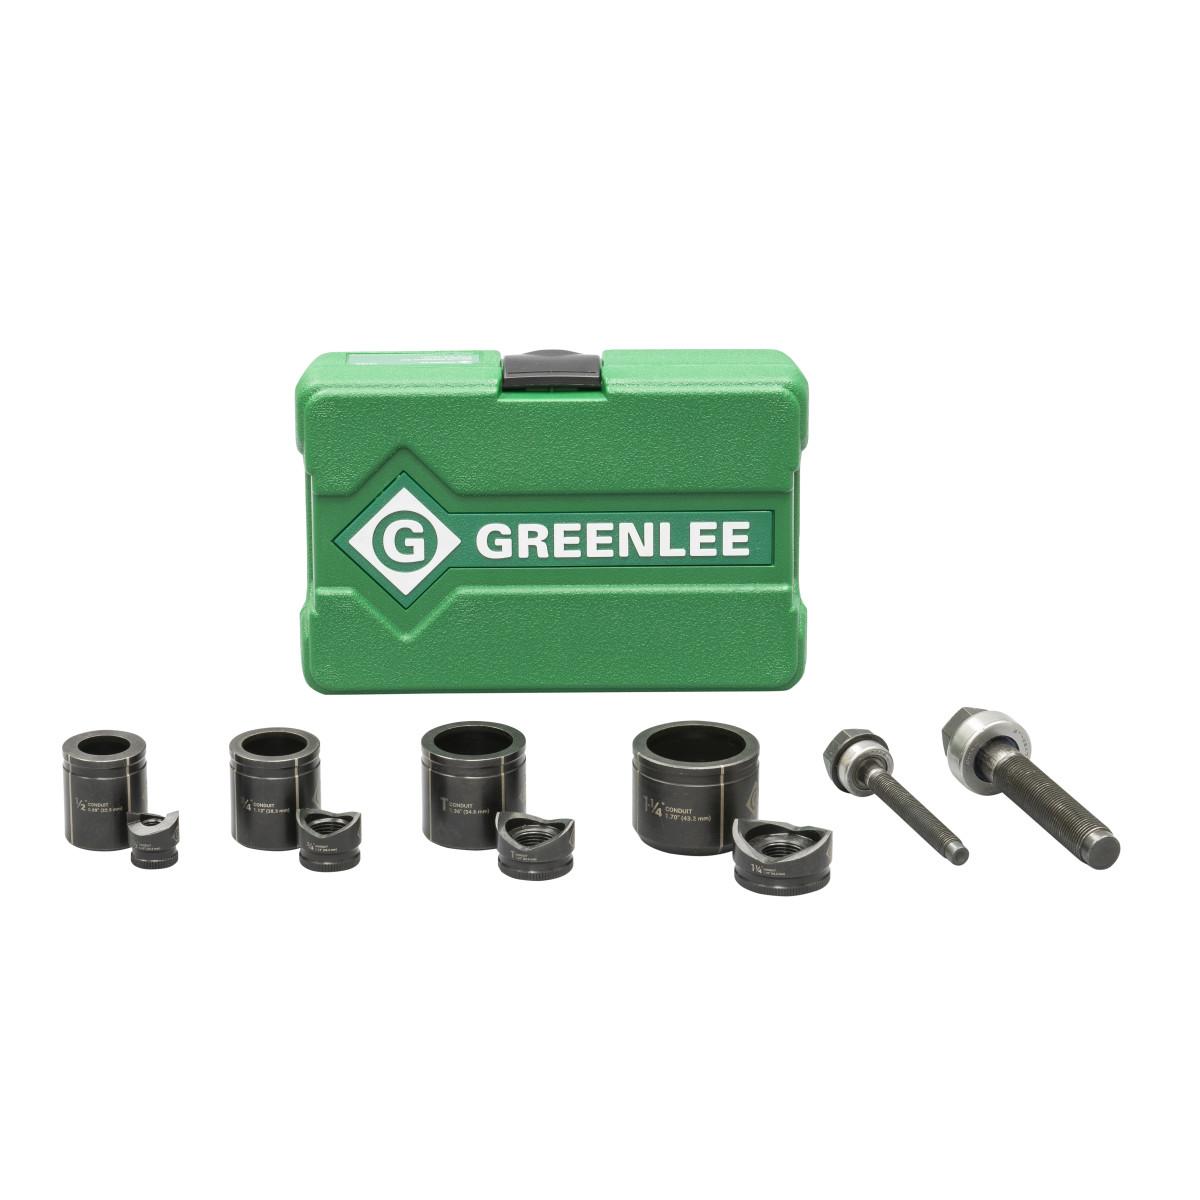 "Greenlee 735BB Standard Knockout Punch Set 1/2"" - 1-1/4"" Conduit Size"